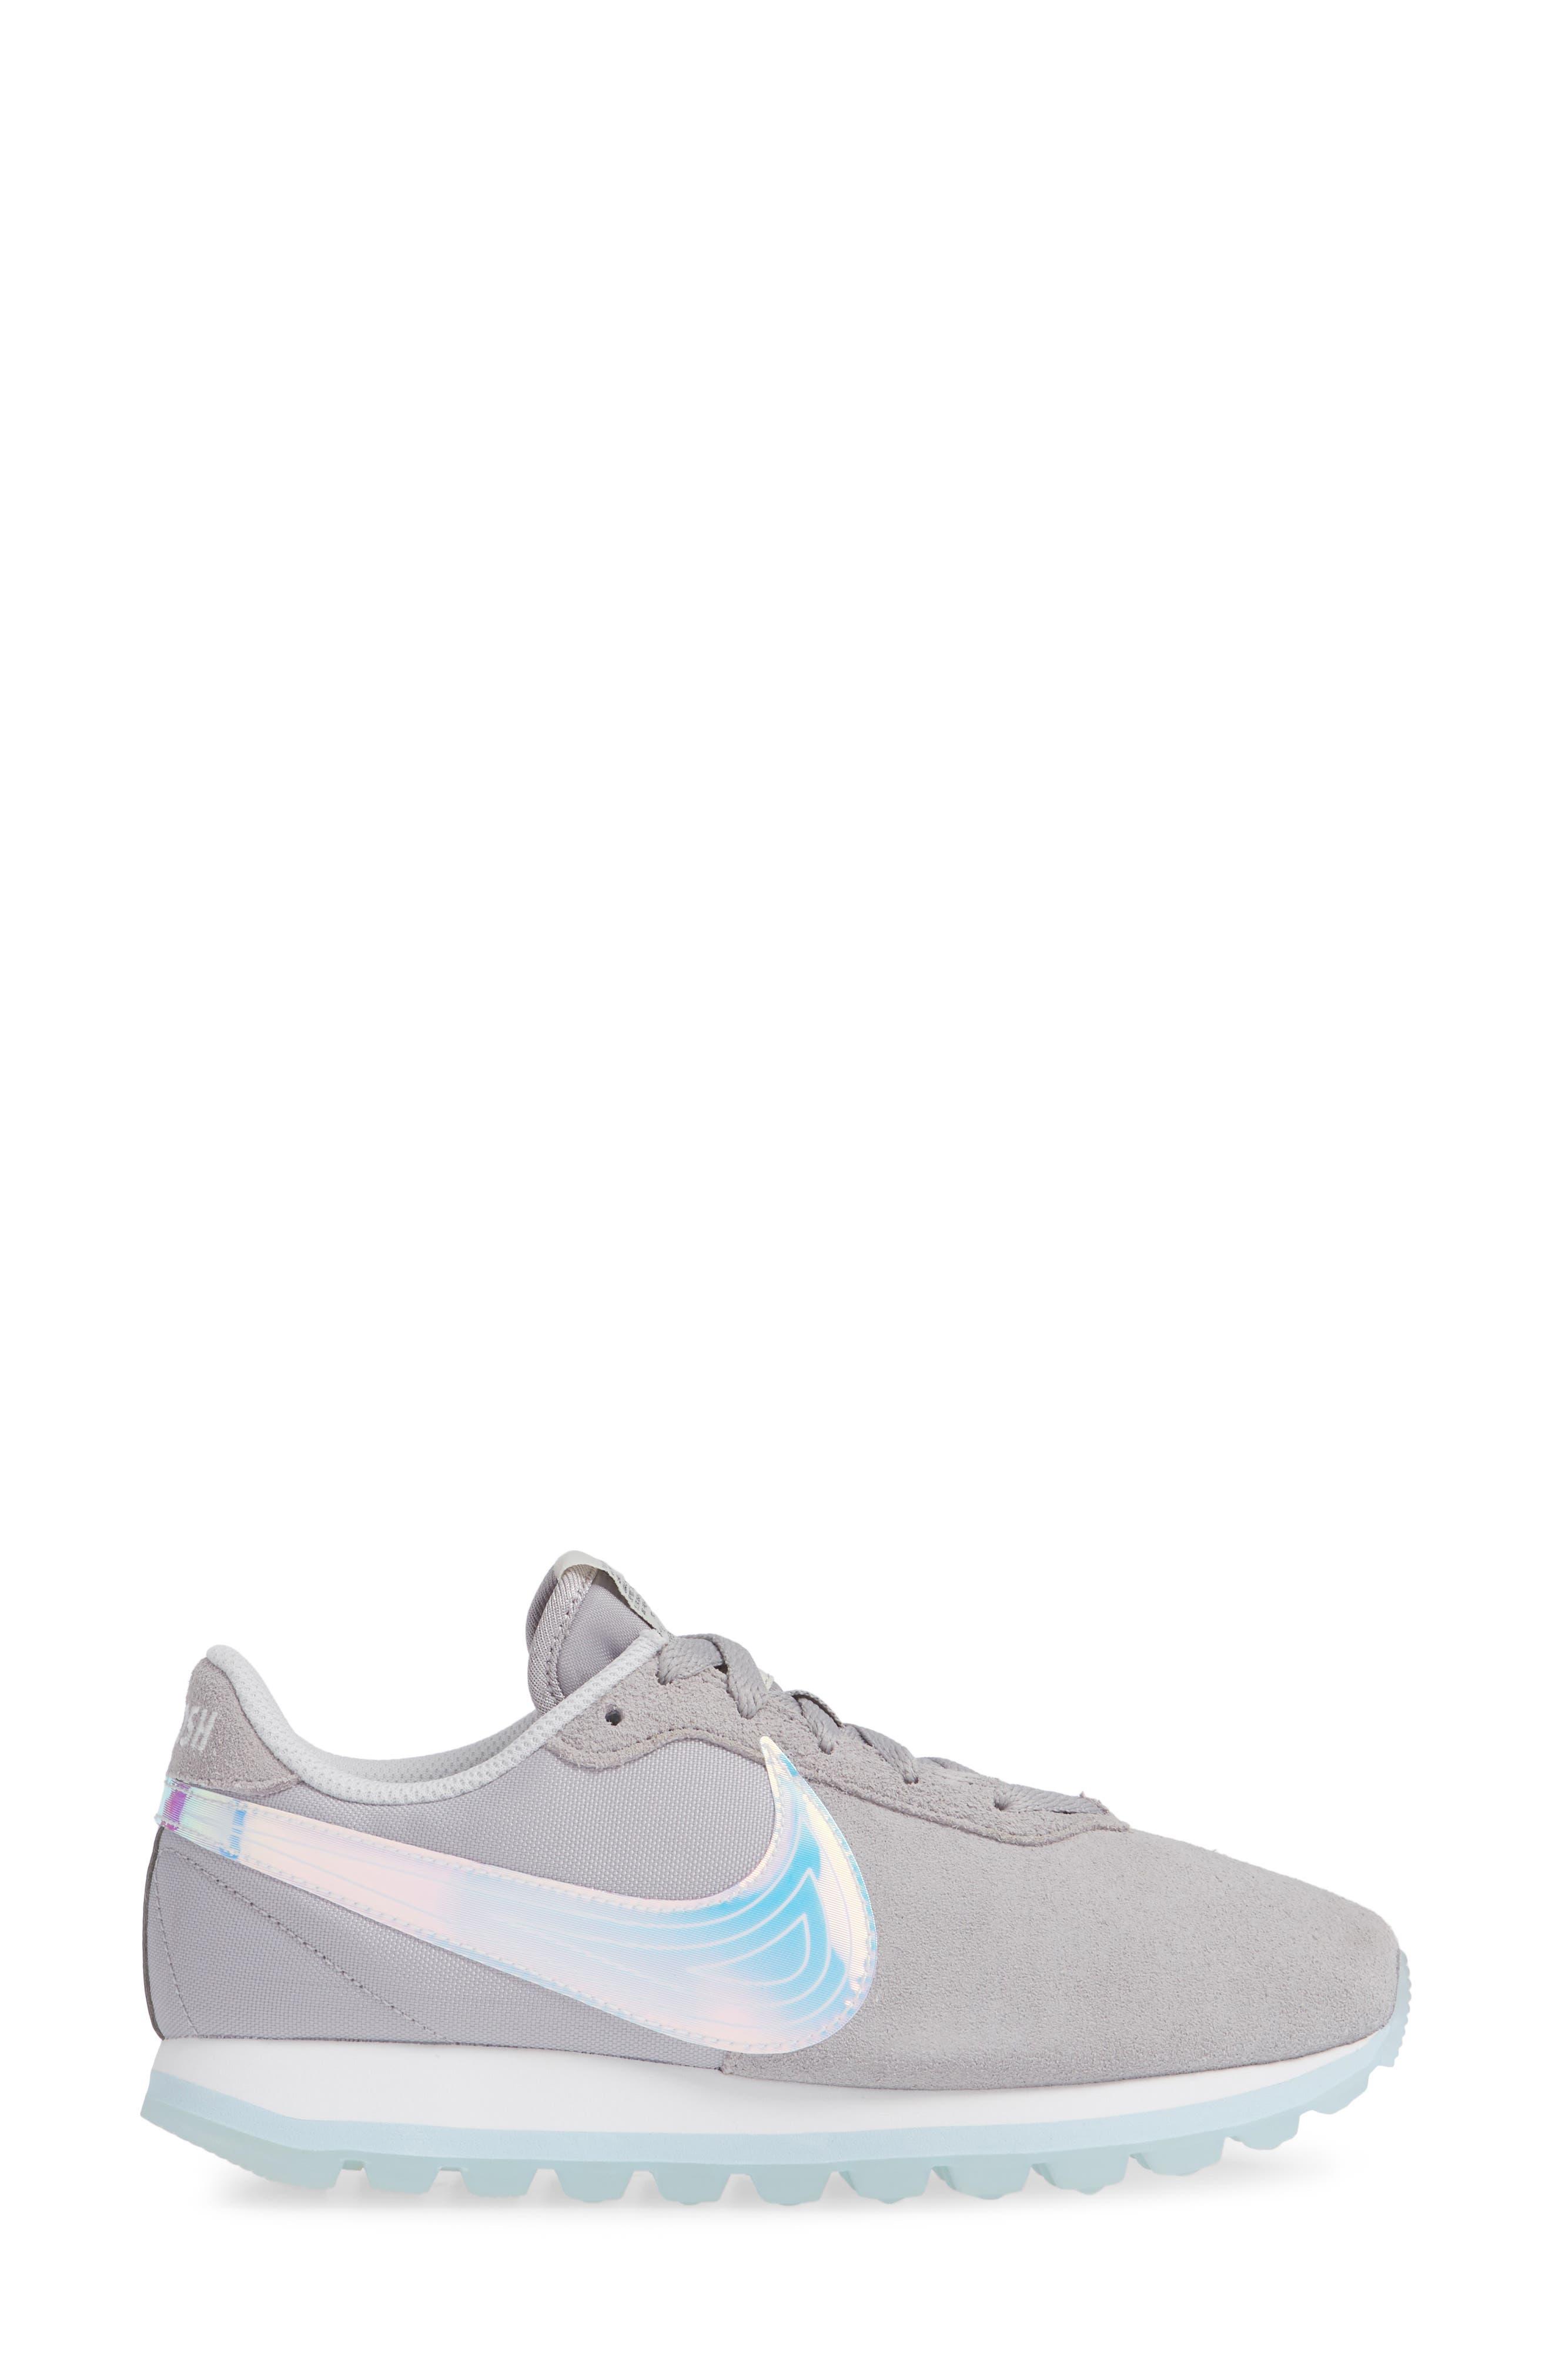 Pre Love O.X. Sneaker,                             Alternate thumbnail 3, color,                             ATMOSPHERE GREY/ WHITE/ GREY